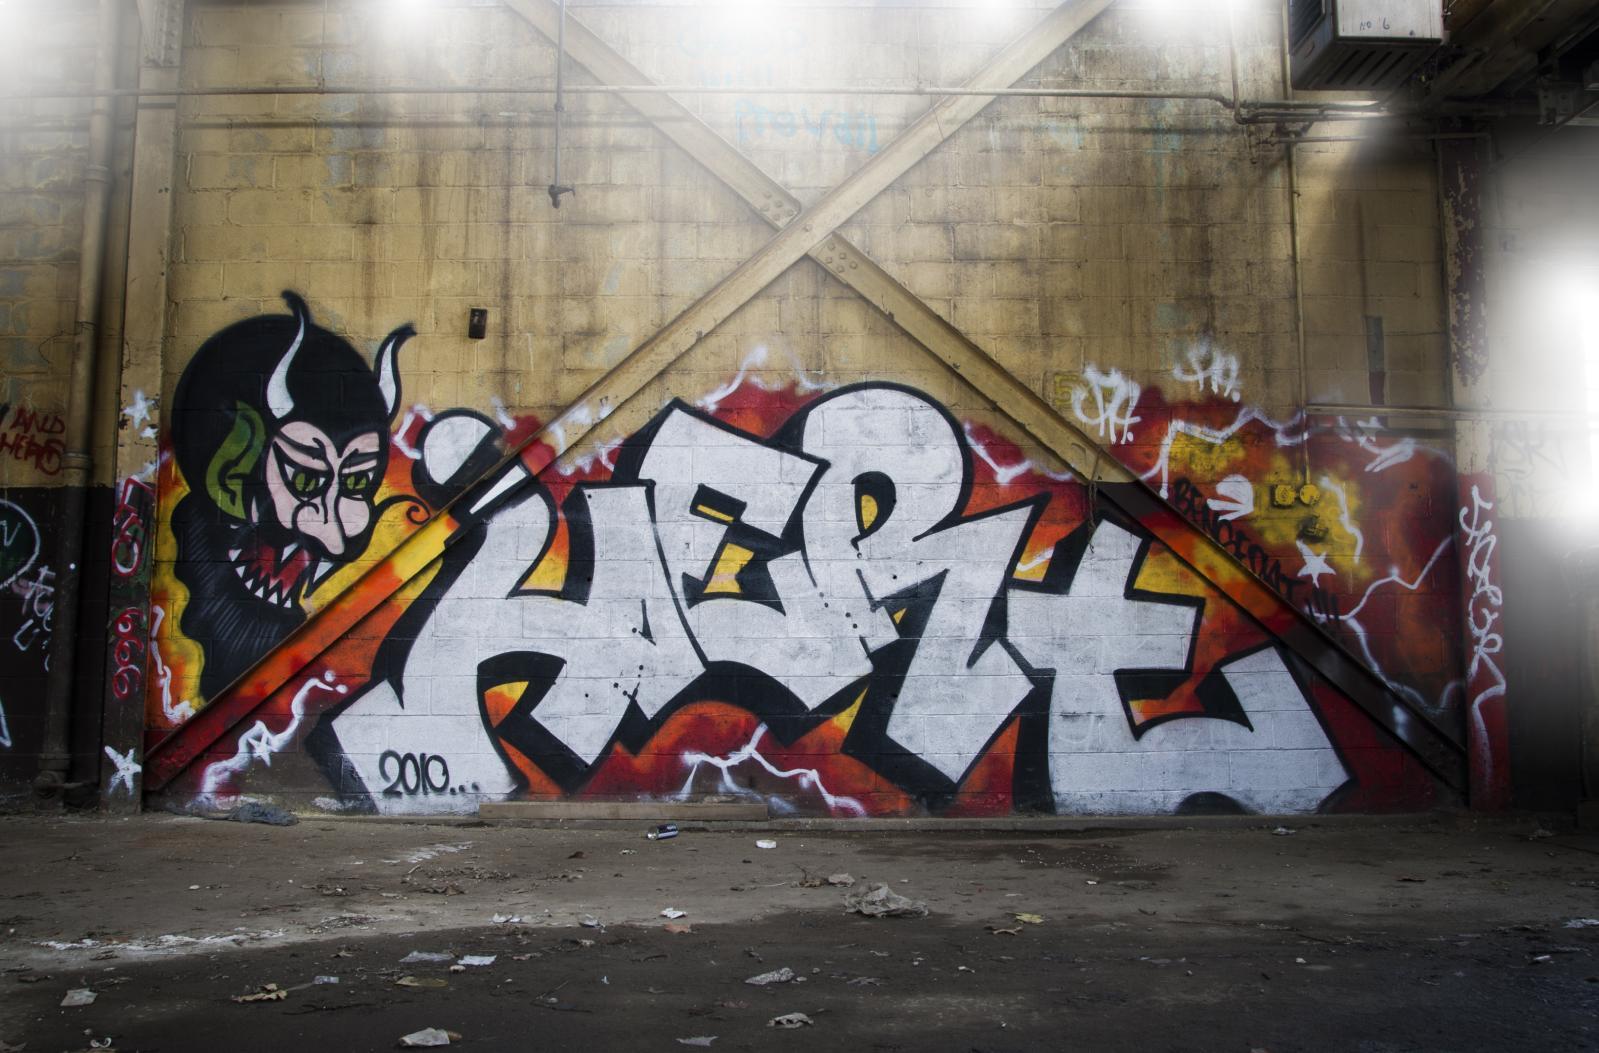 Dark wall devil graffiti street art mural art area newyork ny nyc newyorkcity queens piece hert